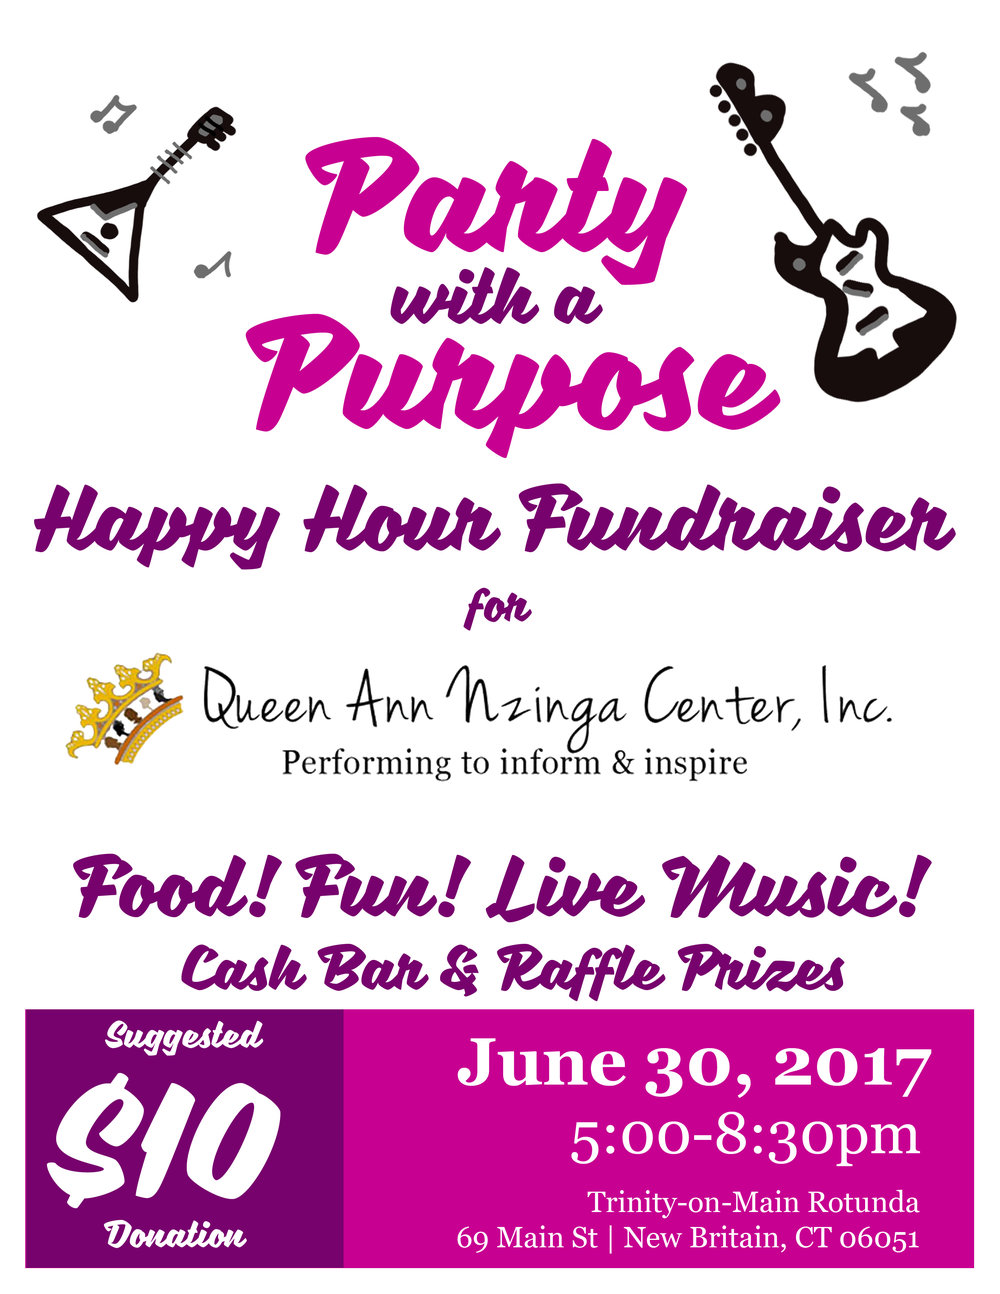 fundraiser happy hour.jpg